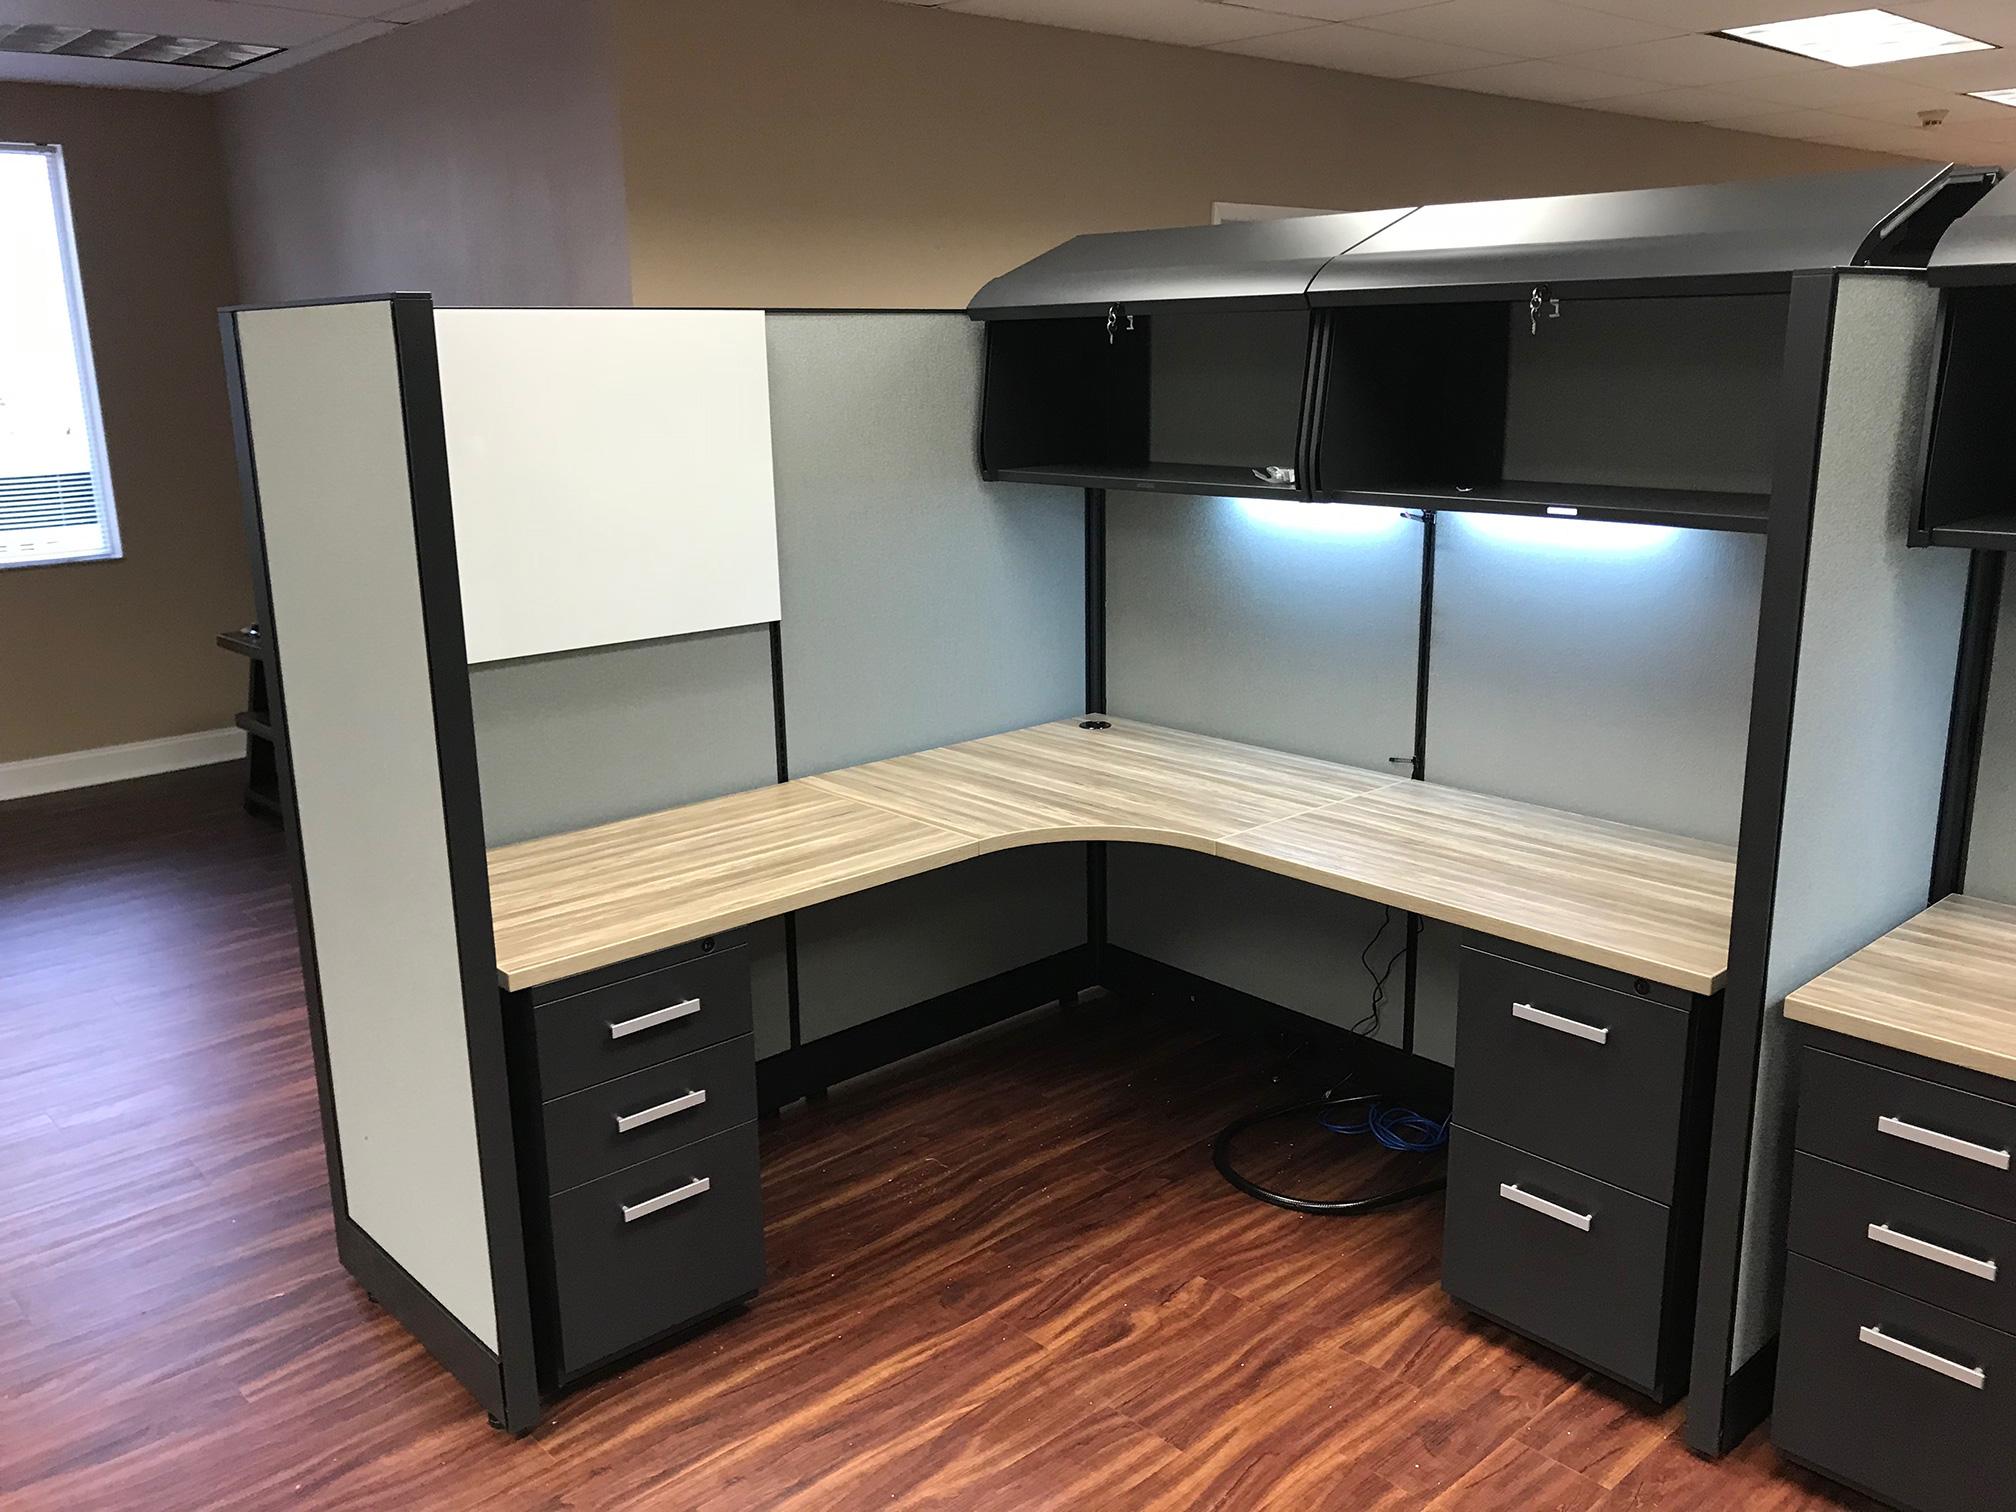 cubicle-walls-manasota-office-supplies-llc.jpg